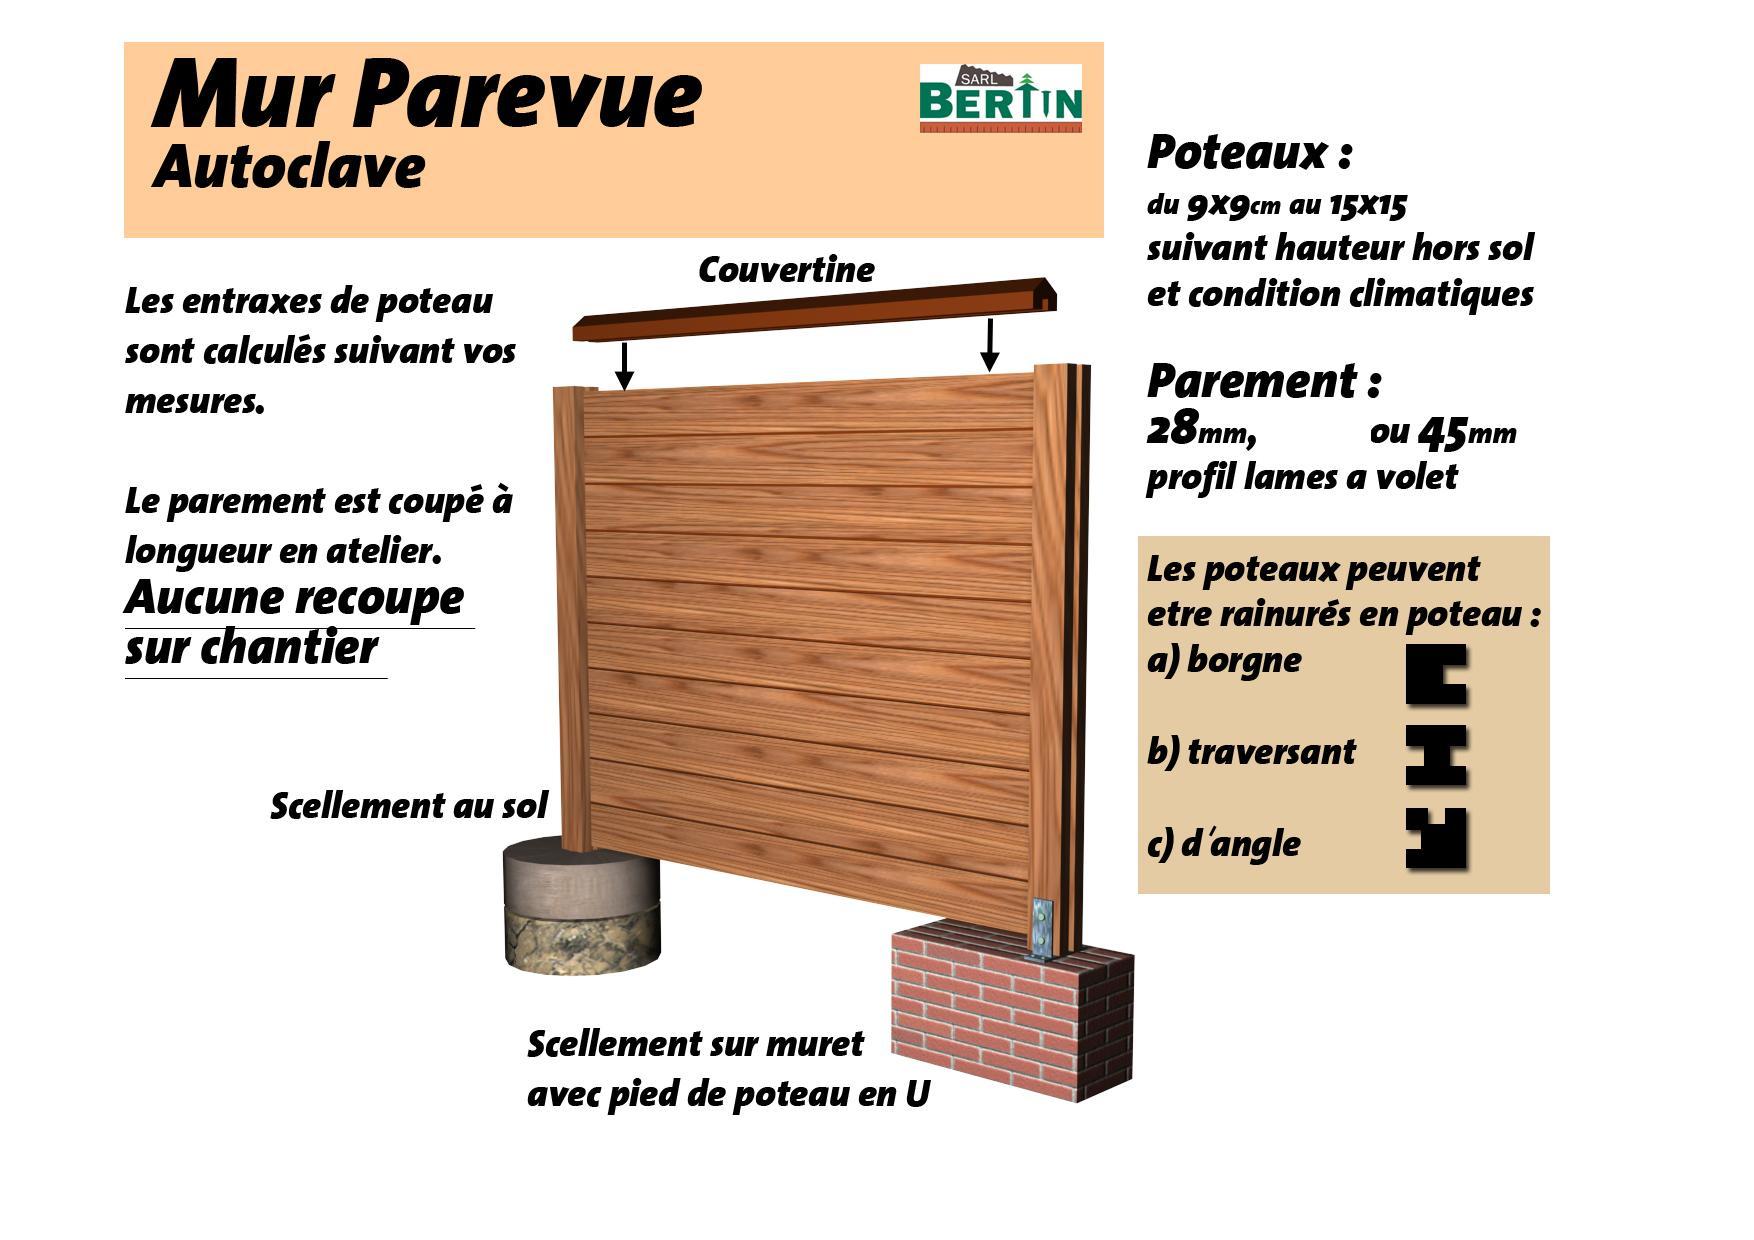 mur pare vue plein au m pleine masse p 27mm poteau 10 10 menuiserie bertin. Black Bedroom Furniture Sets. Home Design Ideas